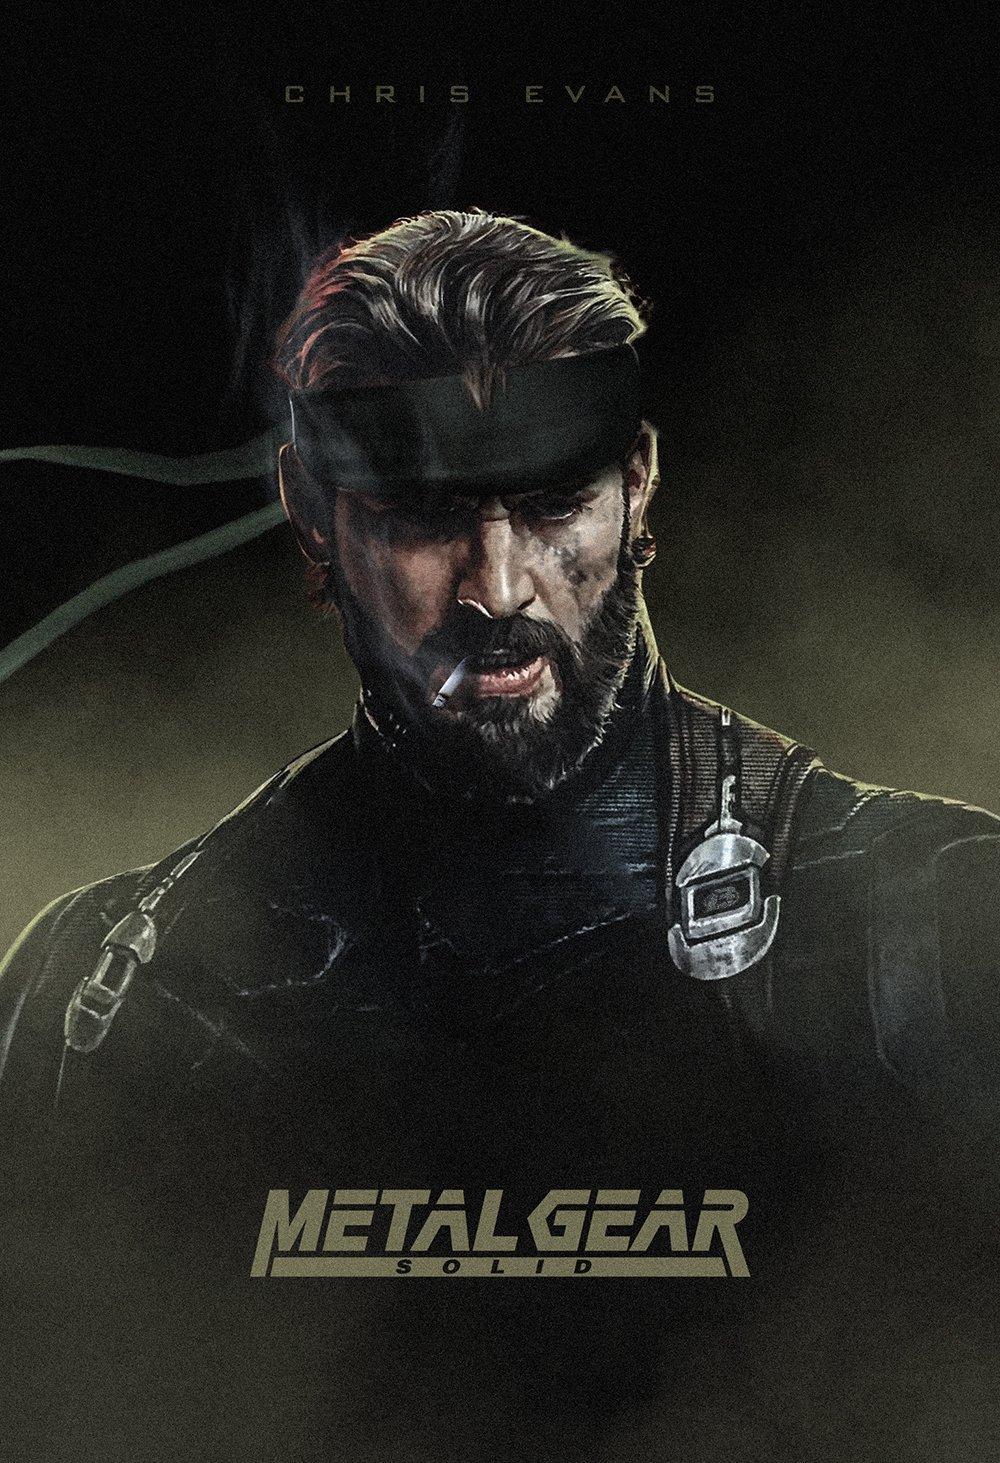 Fondos De Pantalla 1000x1463 Px Chris Evans Metal Gear